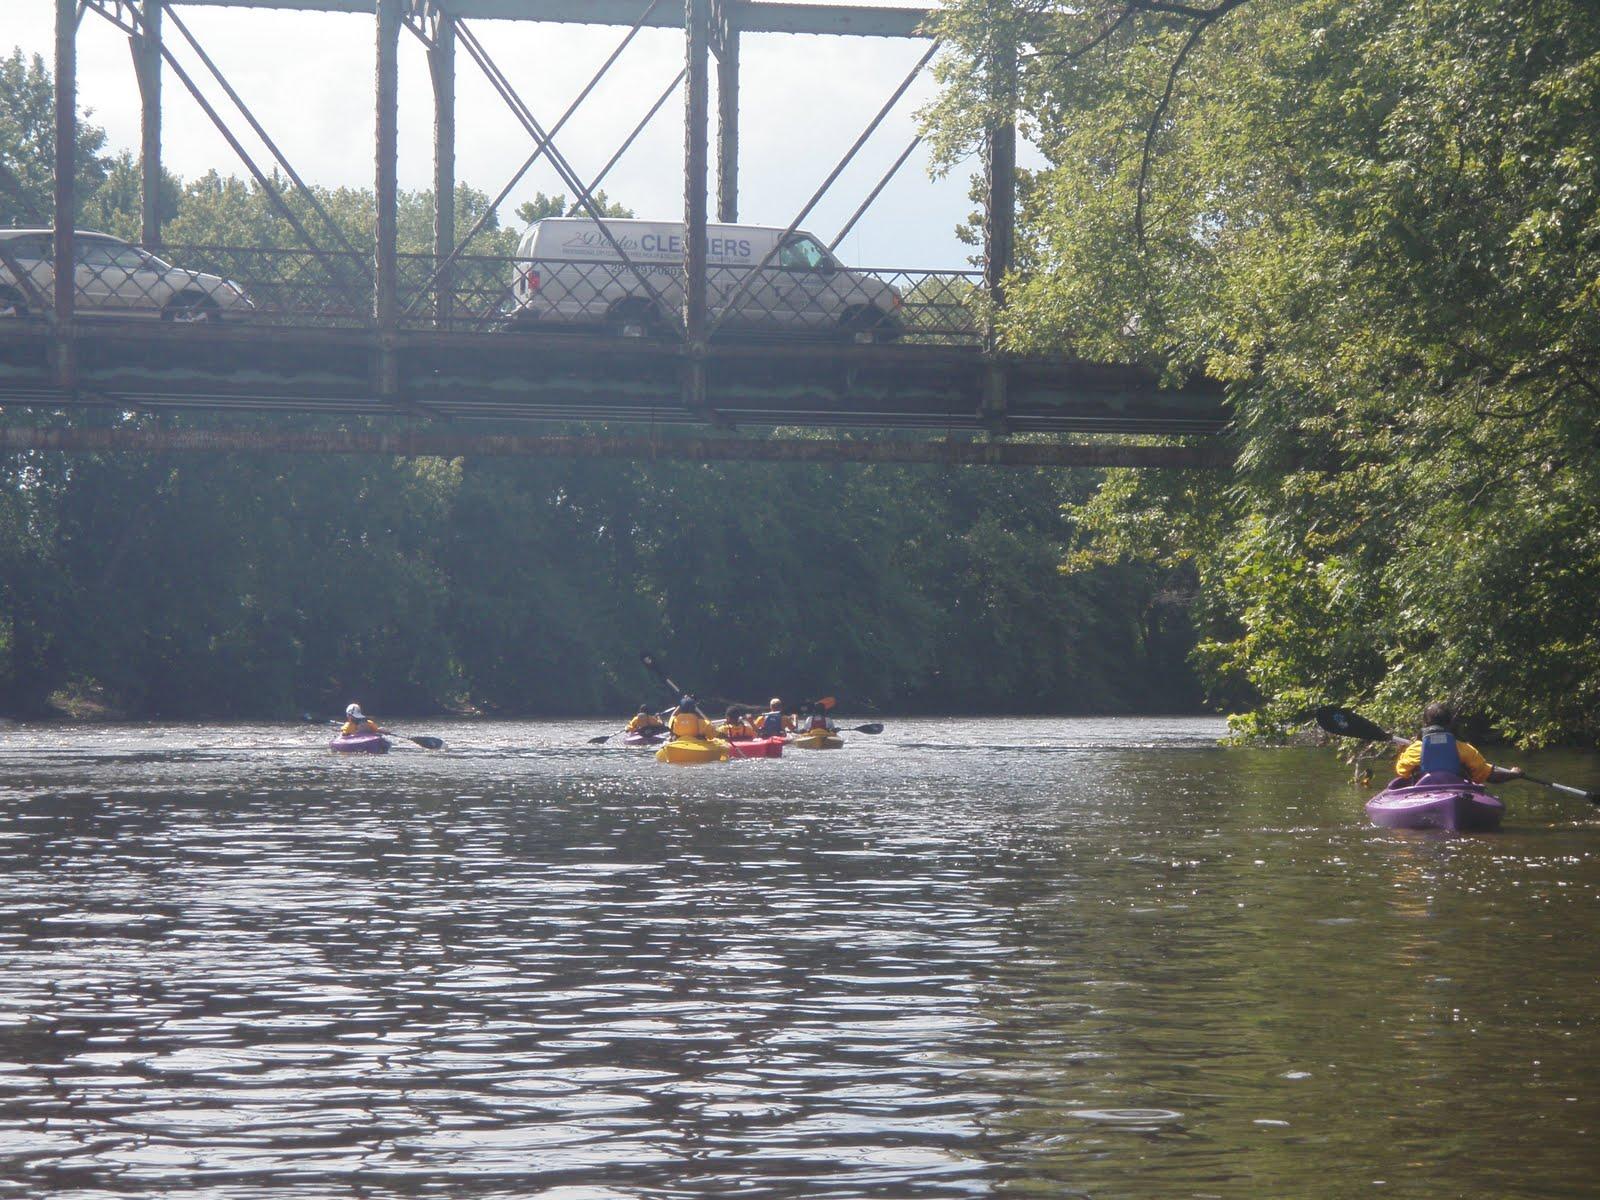 John 39 s kayak river of god kayak kamp dav 3 for Passaic river fishing